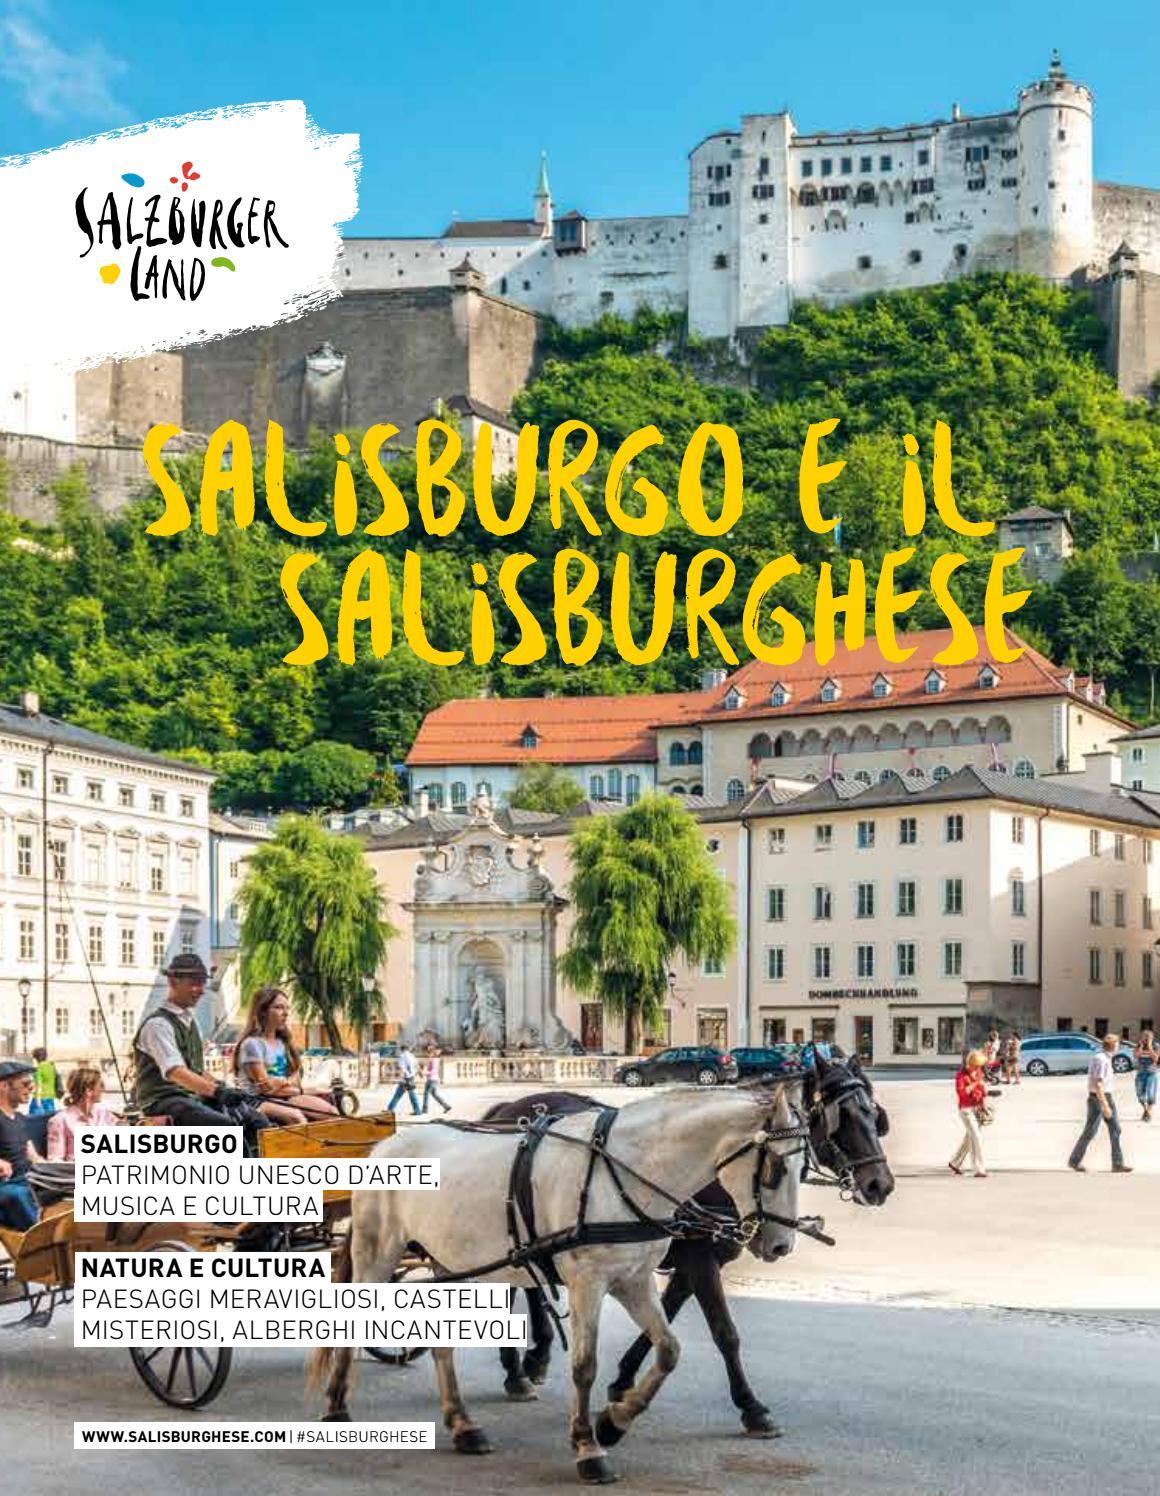 abd80f187f Salisburgo e il Salisburghese by SalzburgerLand - issuu